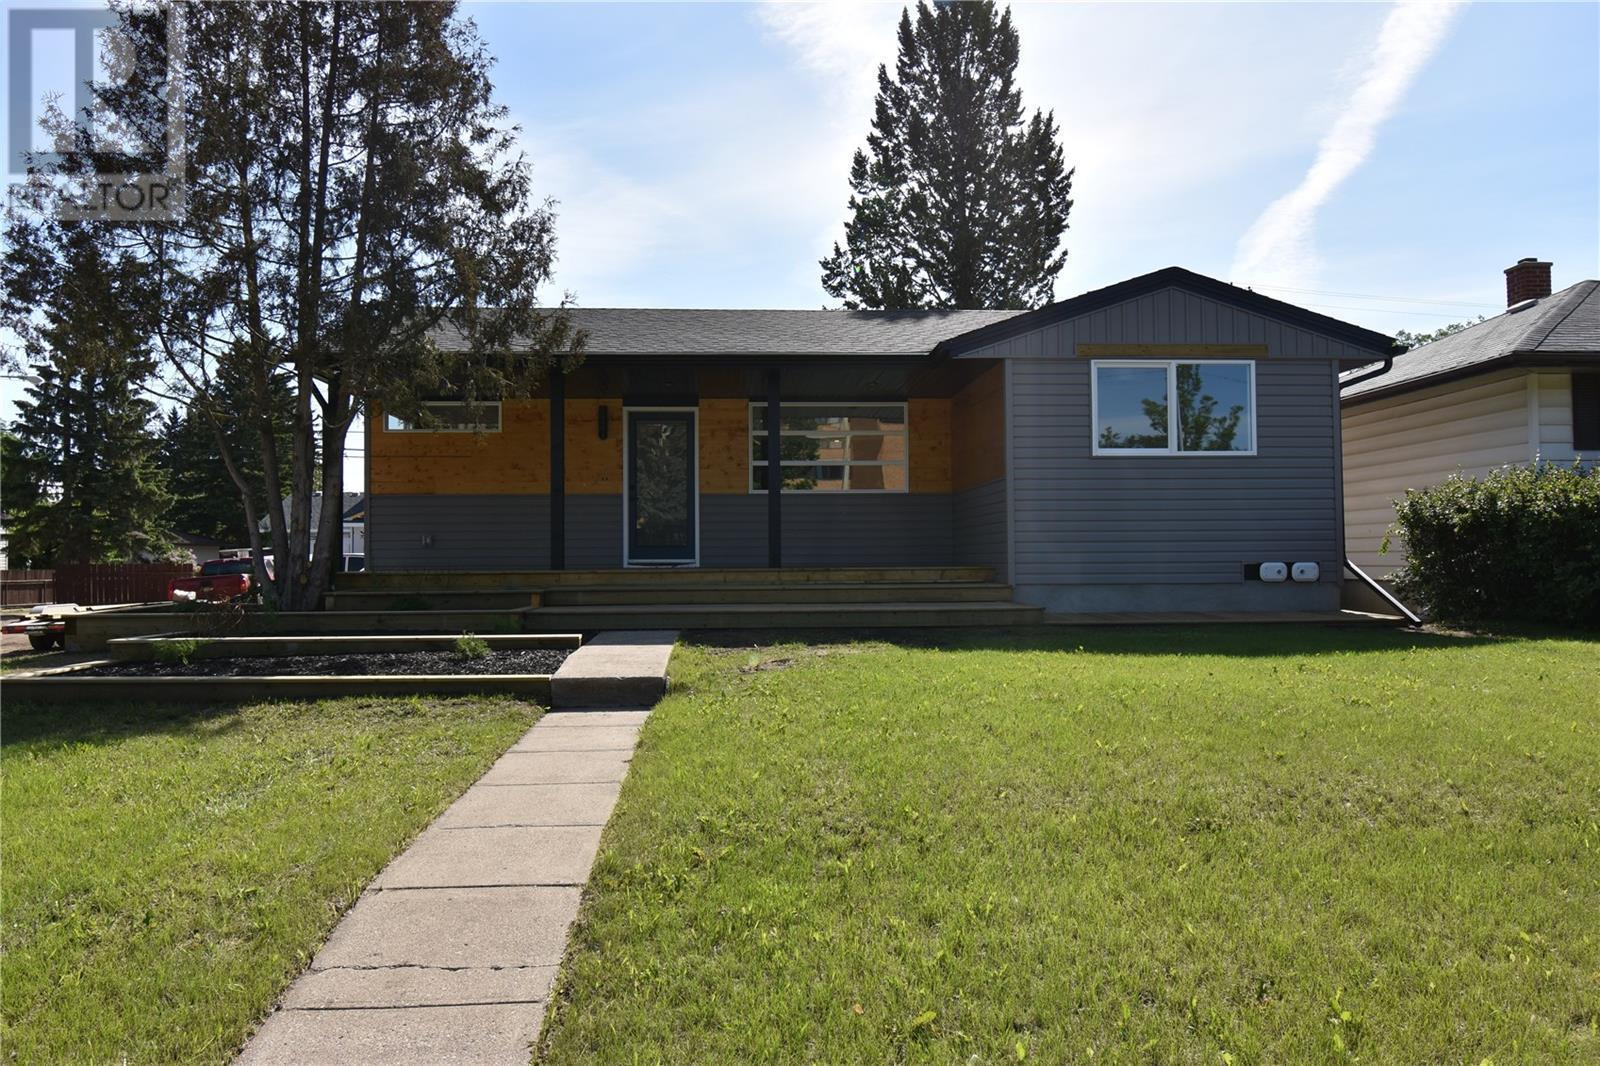 Removed: 836 P Avenue North, Saskatoon, SK - Removed on 2019-07-09 08:36:15